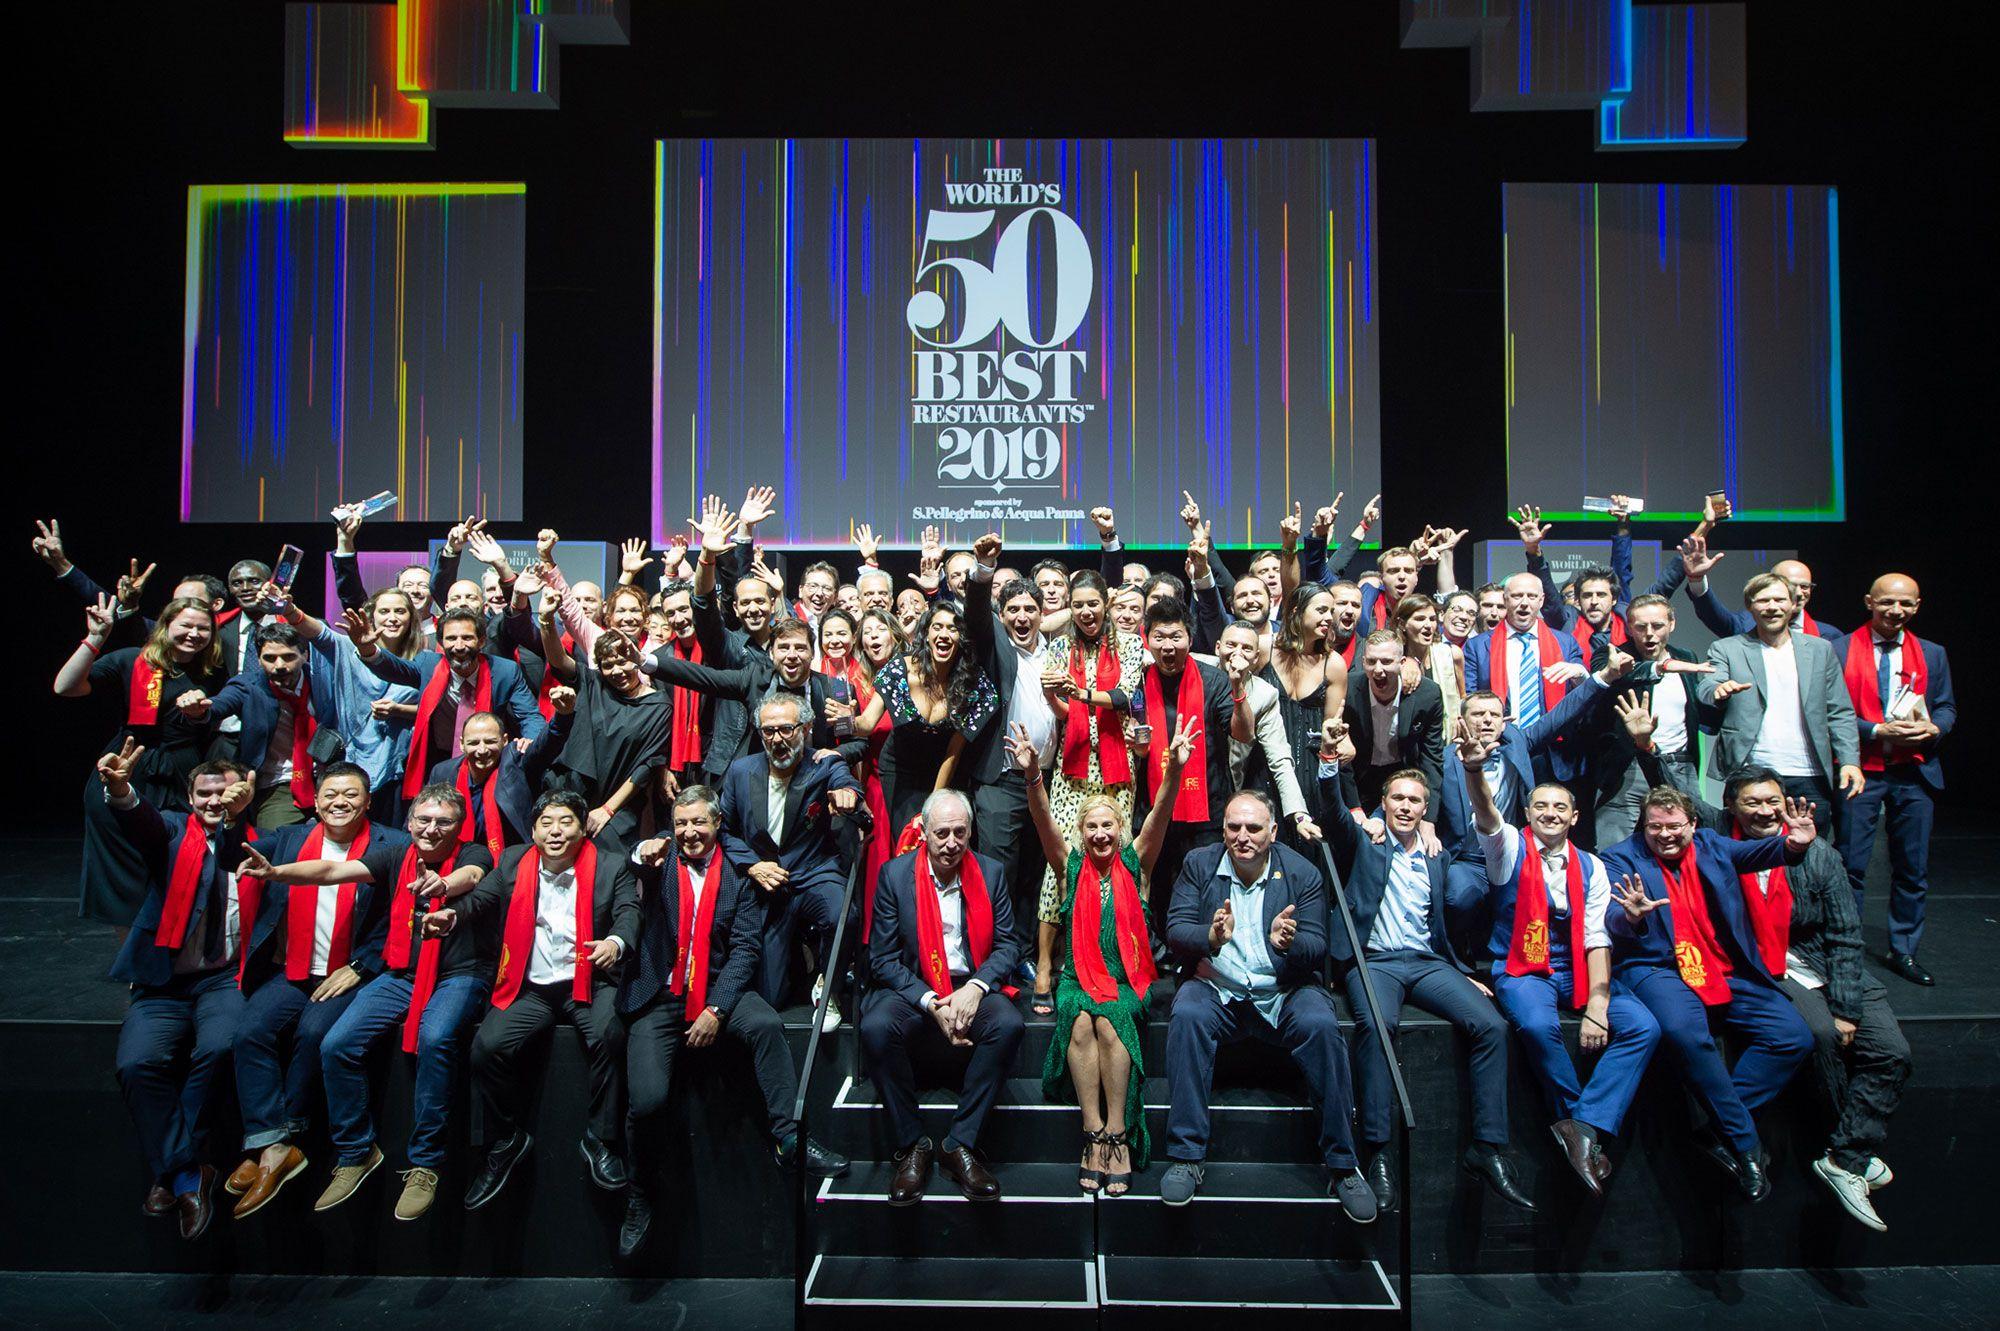 Winners of the World's 50 Best Restaurants 2019